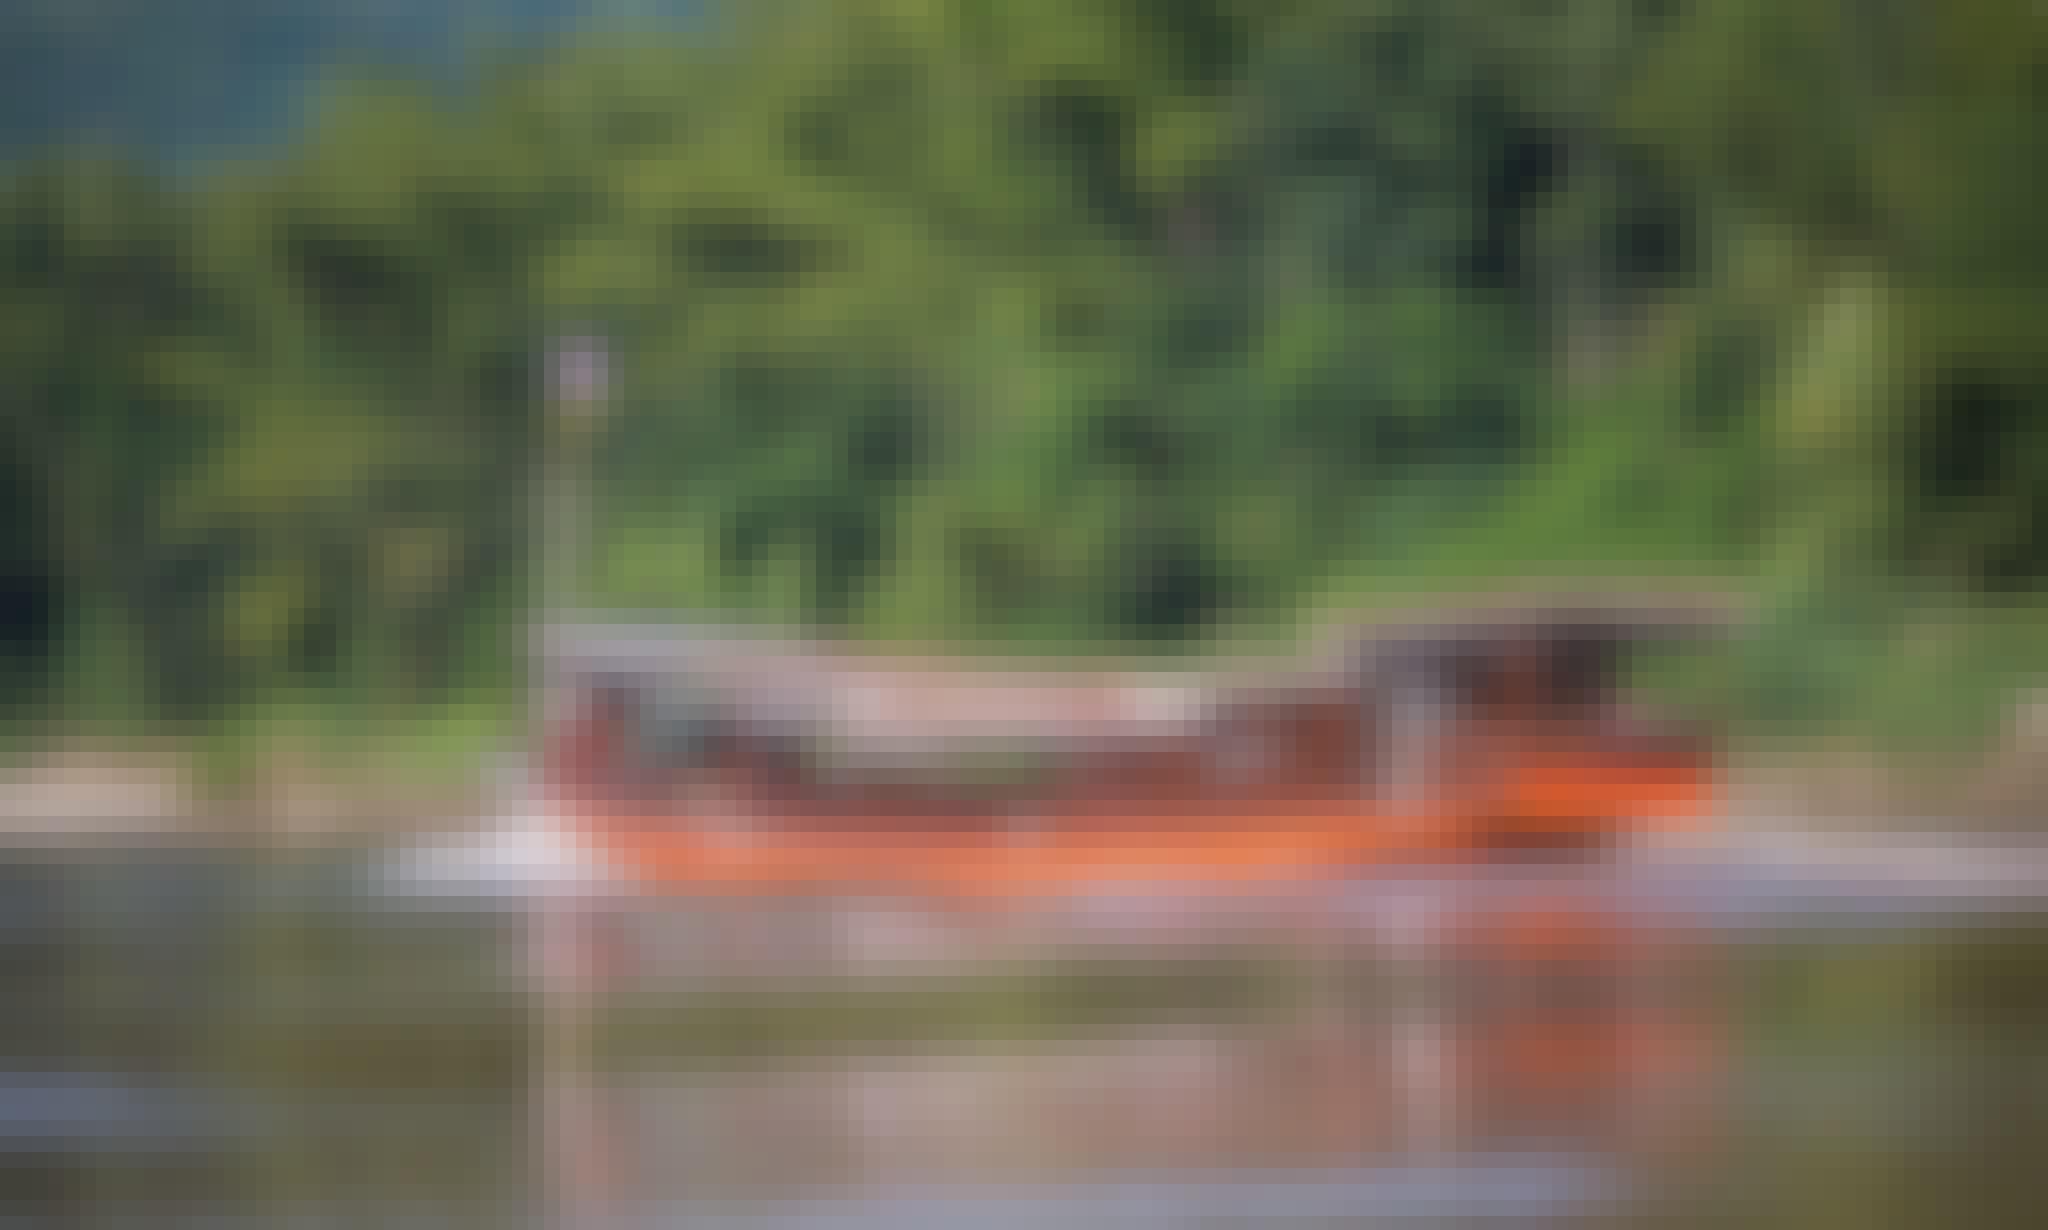 Enjoy Mekong River Cruises in Hanoi, Vietnam on 112' Canal Boat